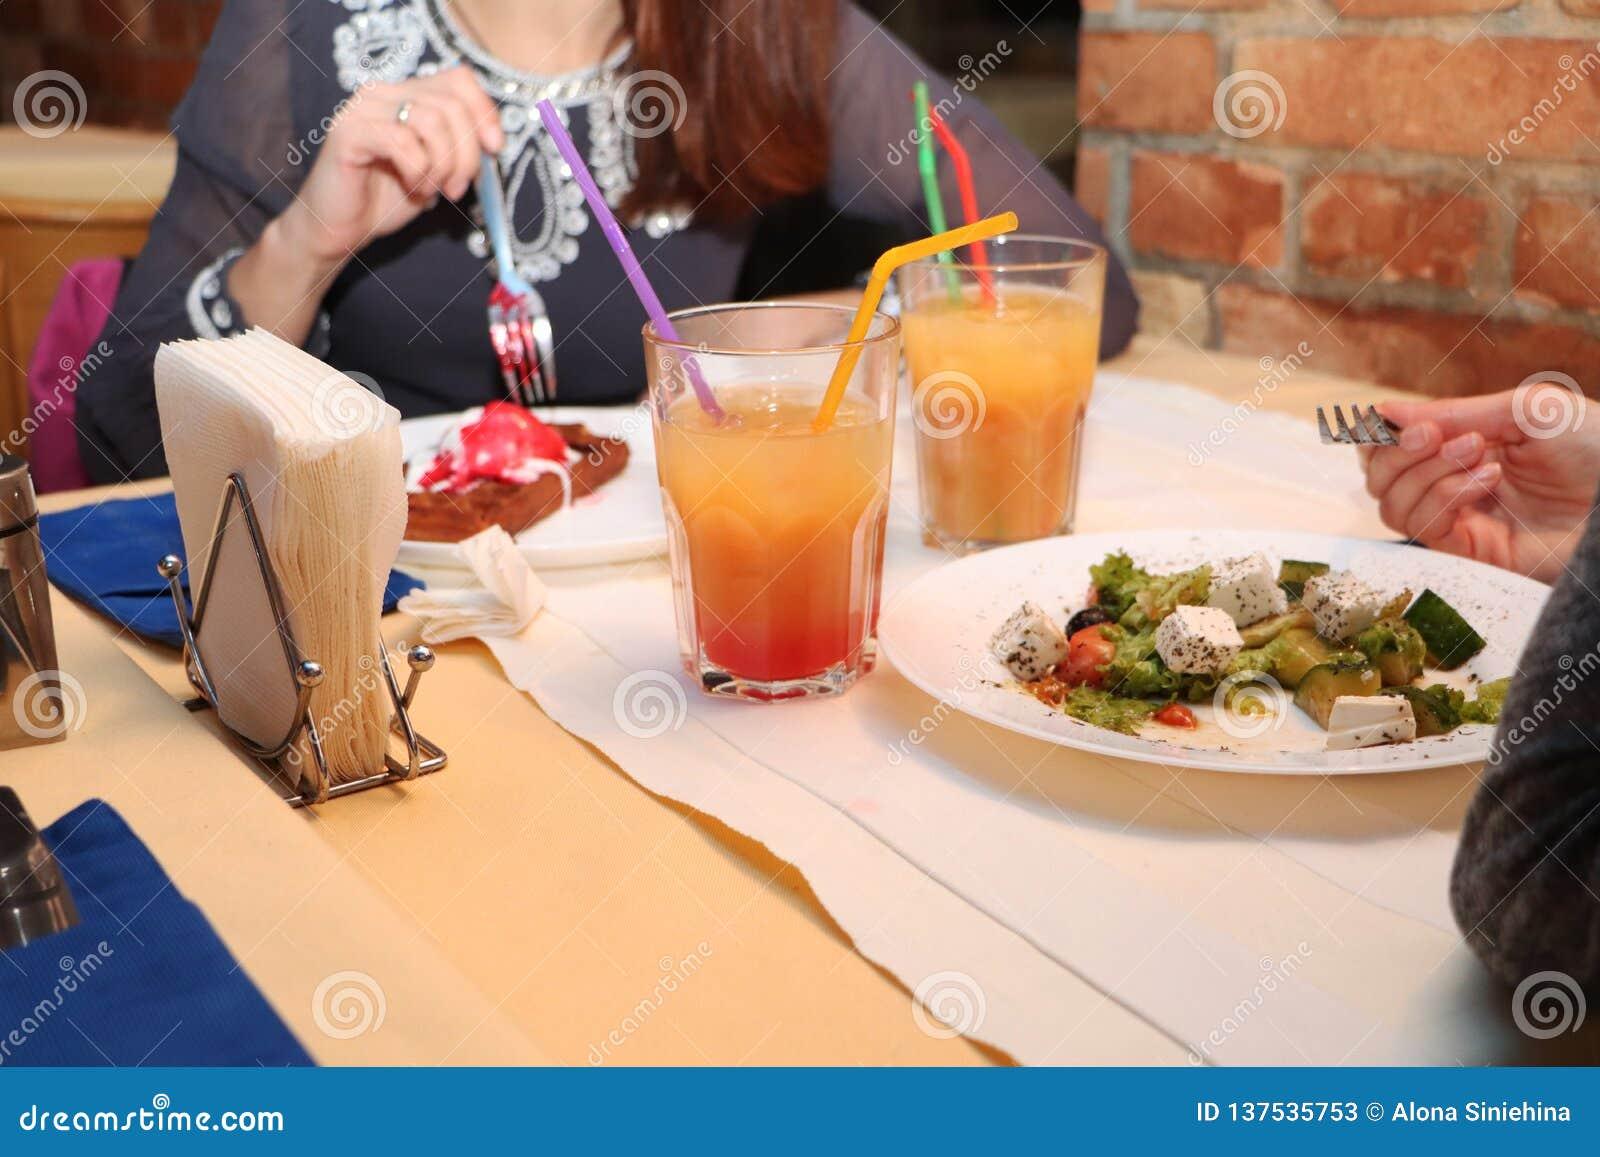 Girls eat Greek salad in a restaurant and drink cocktails